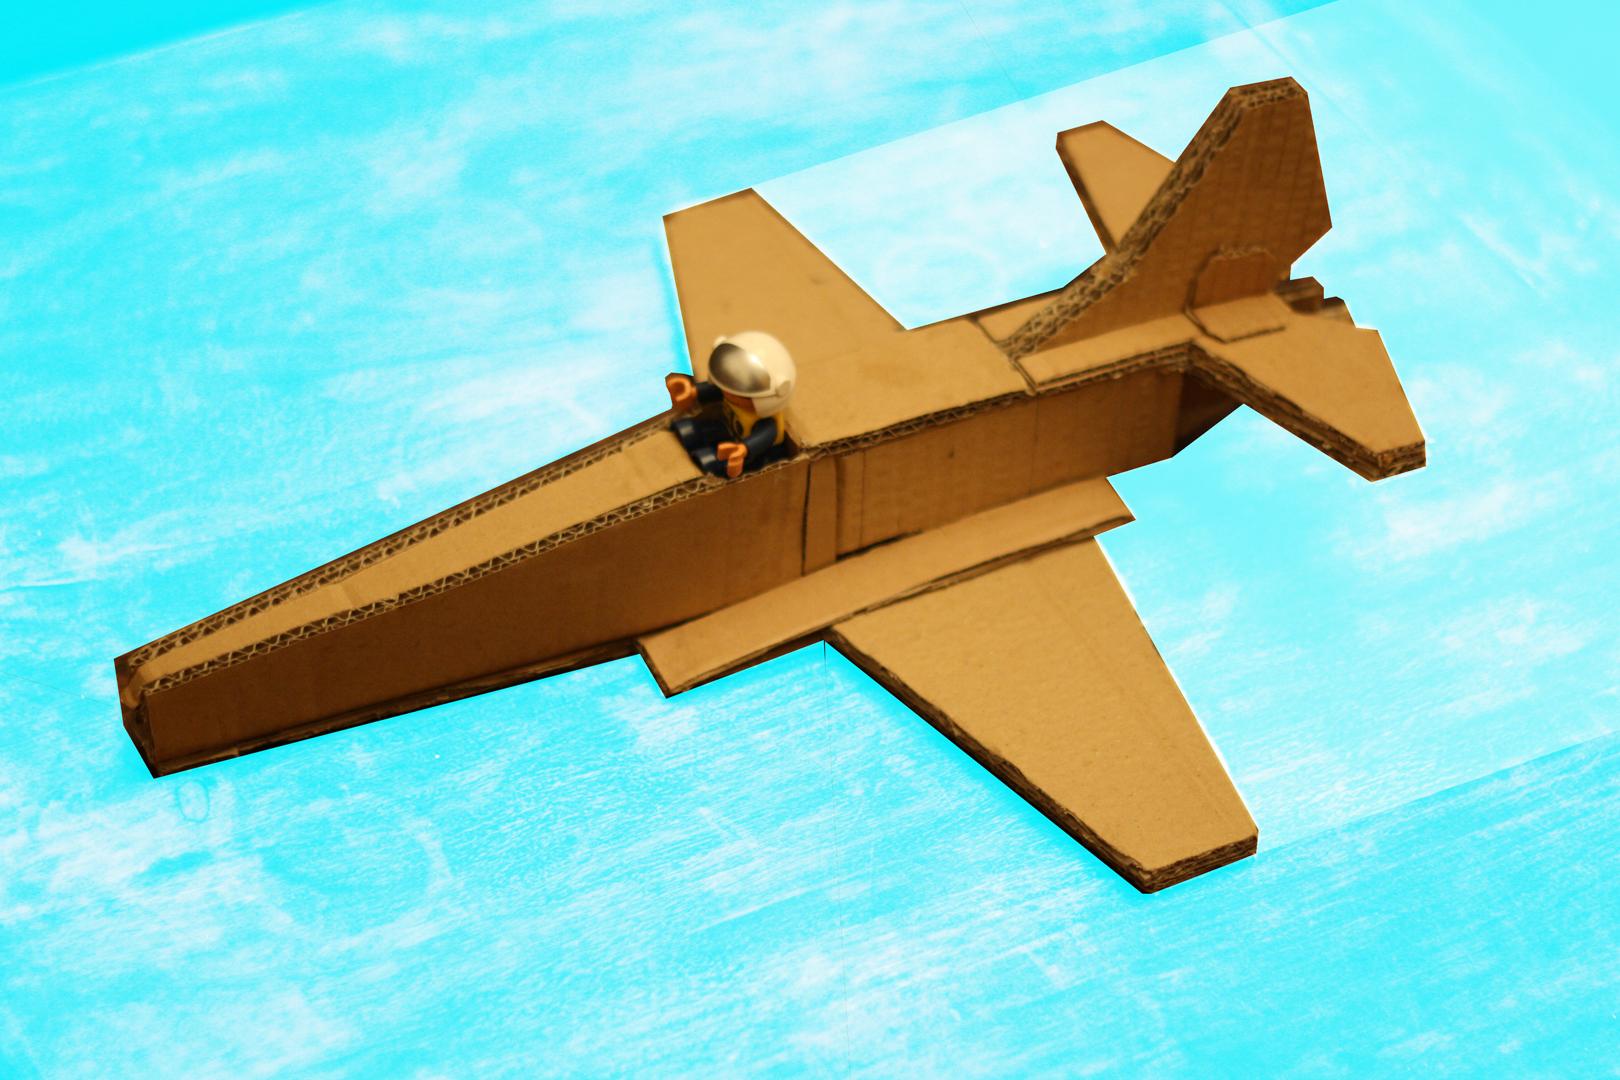 ... box airplane cardboard plane cardboard box airplane cardboard